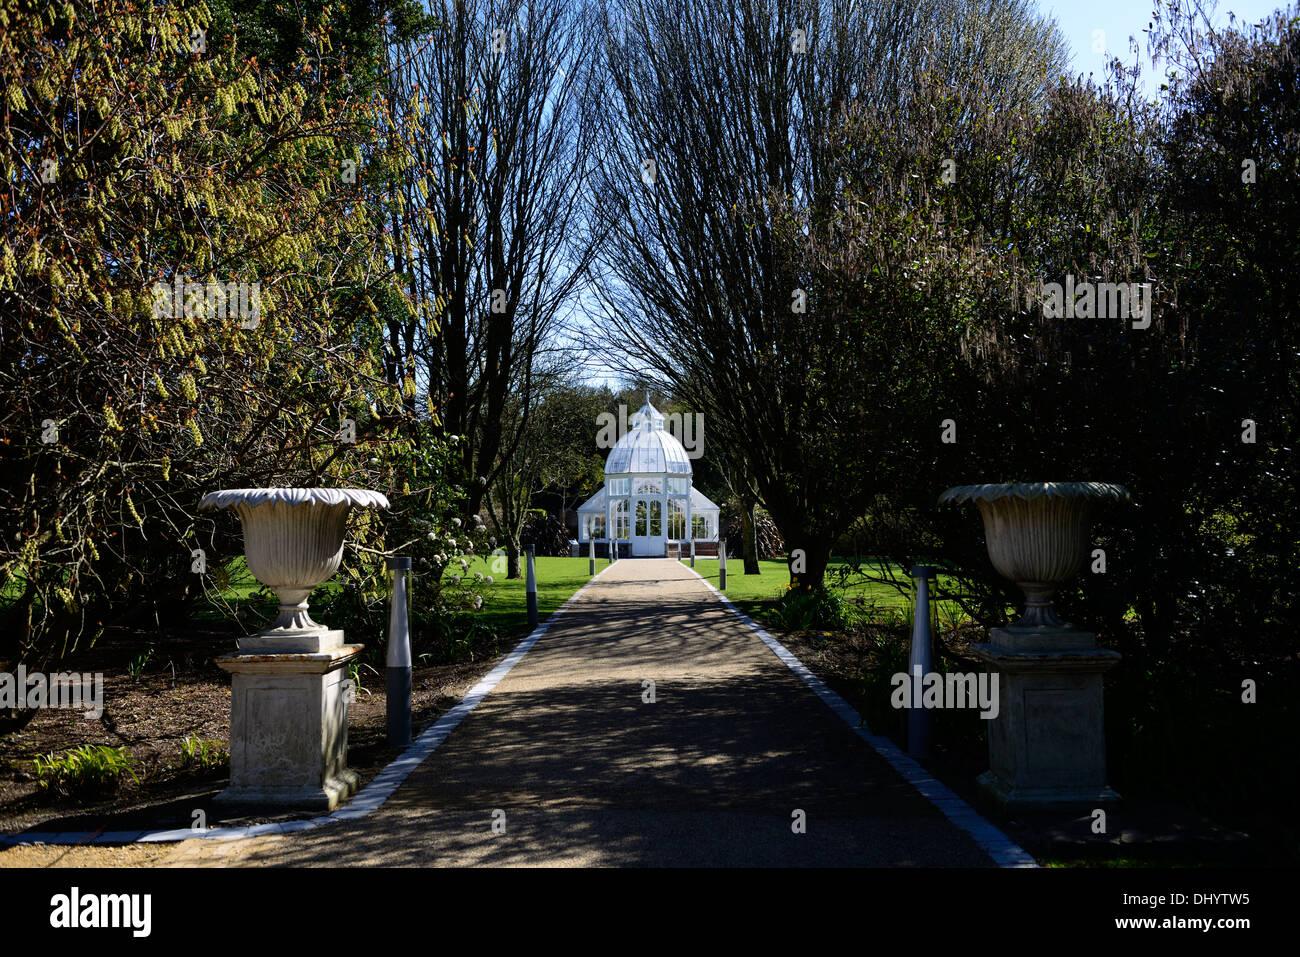 Malahide castle and Gardens Dublin ireland talbot botanic gardens glass house greenhouse - Stock Image